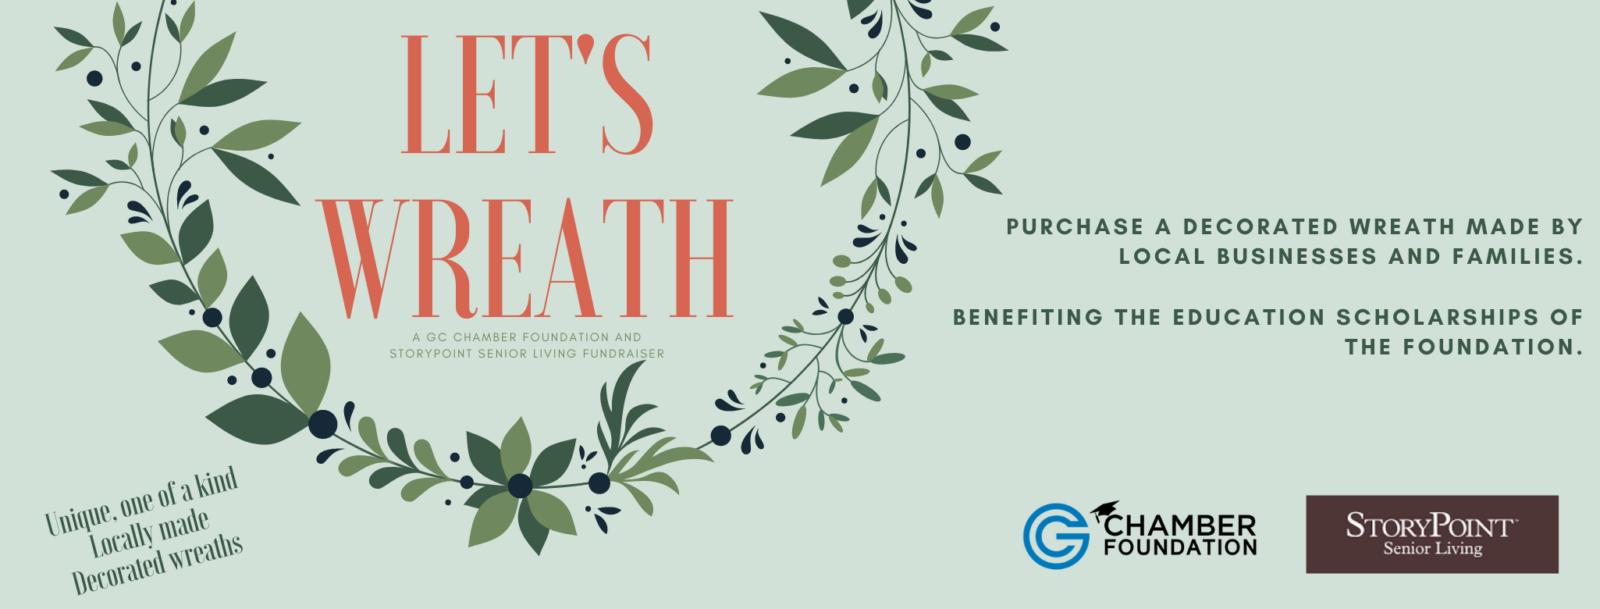 FB Banner GC Foundation Let's Wreath Flyer (2)